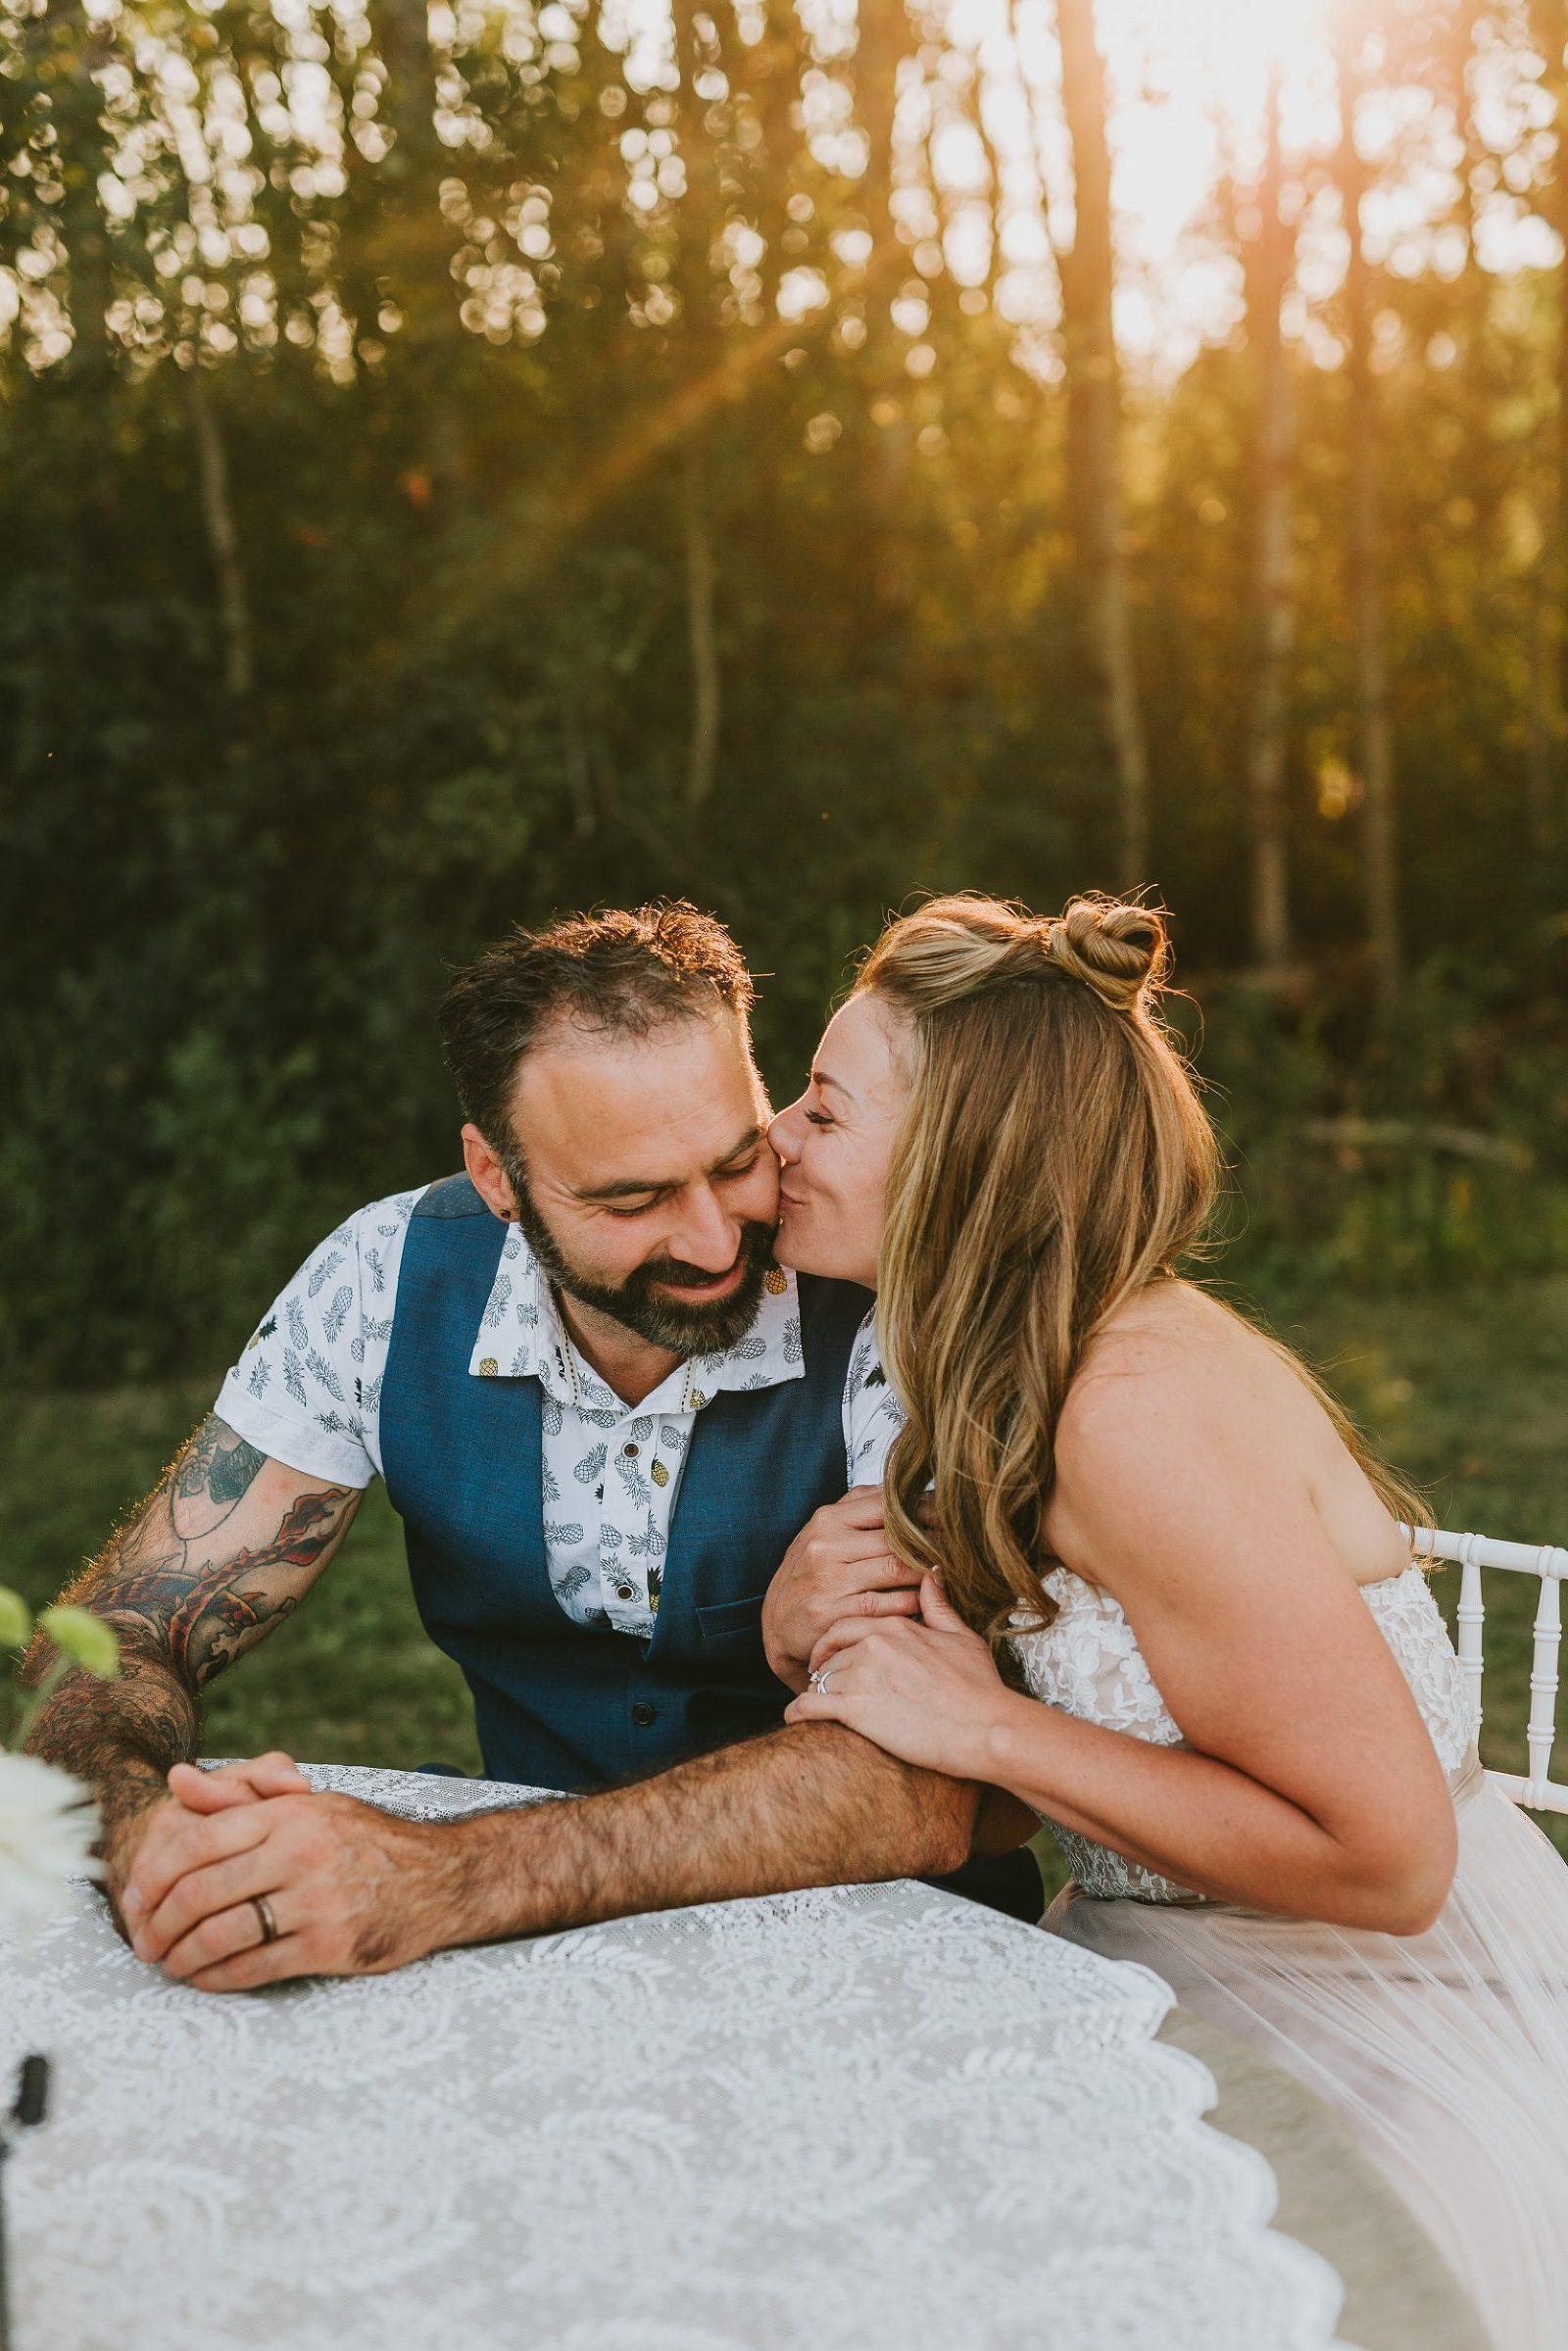 Steph-Sean-Wedding-Emilie-Smith-Photography